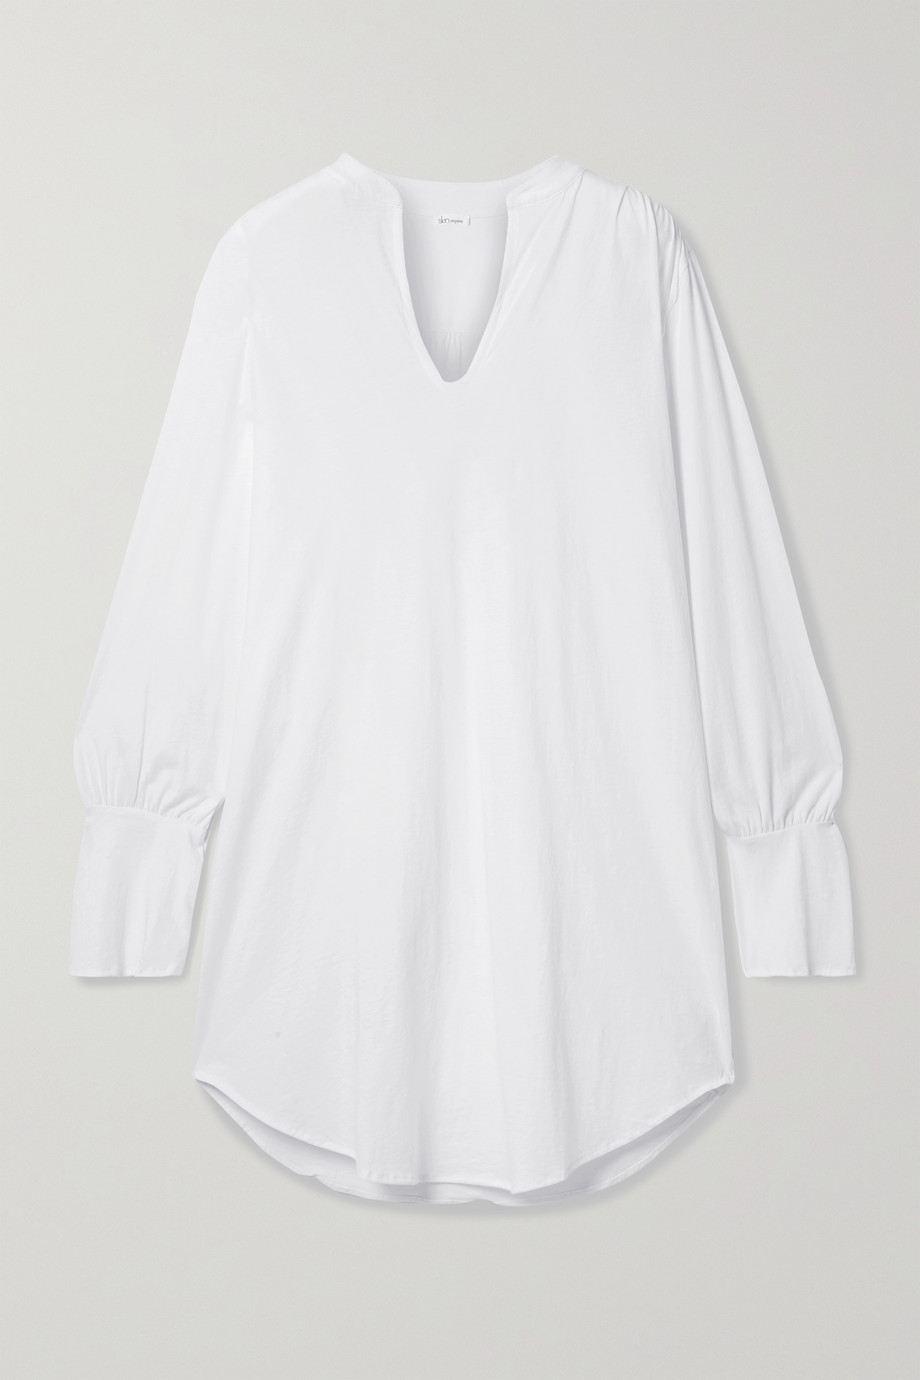 Skin + NET SUSTAIN Kyla organic Pima cotton-jersey pajama top